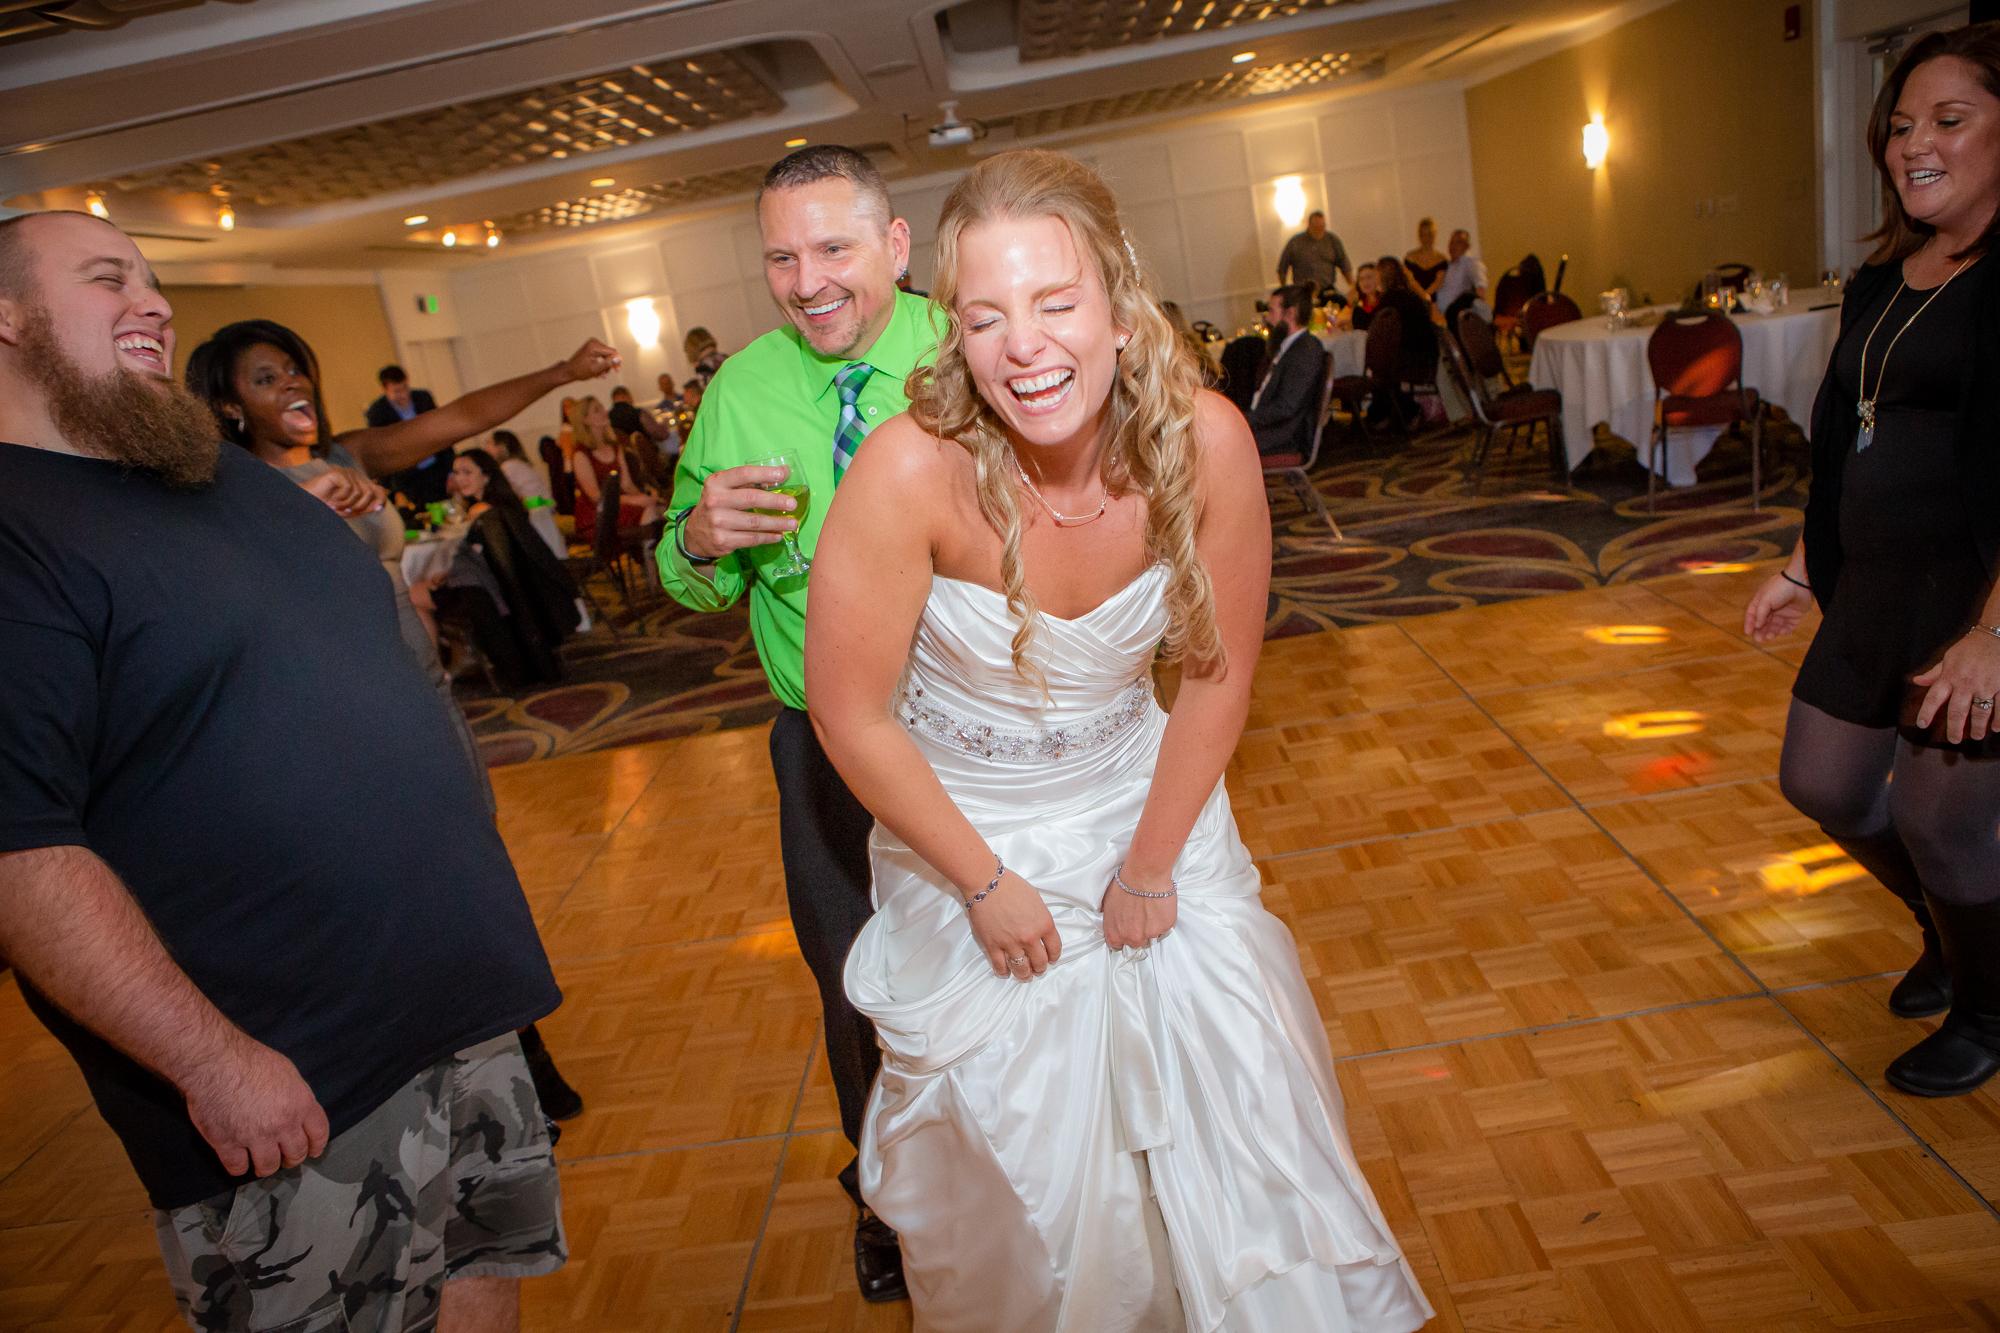 Raddison-Hotel-Corning-NY-Wedding-4738.jpg